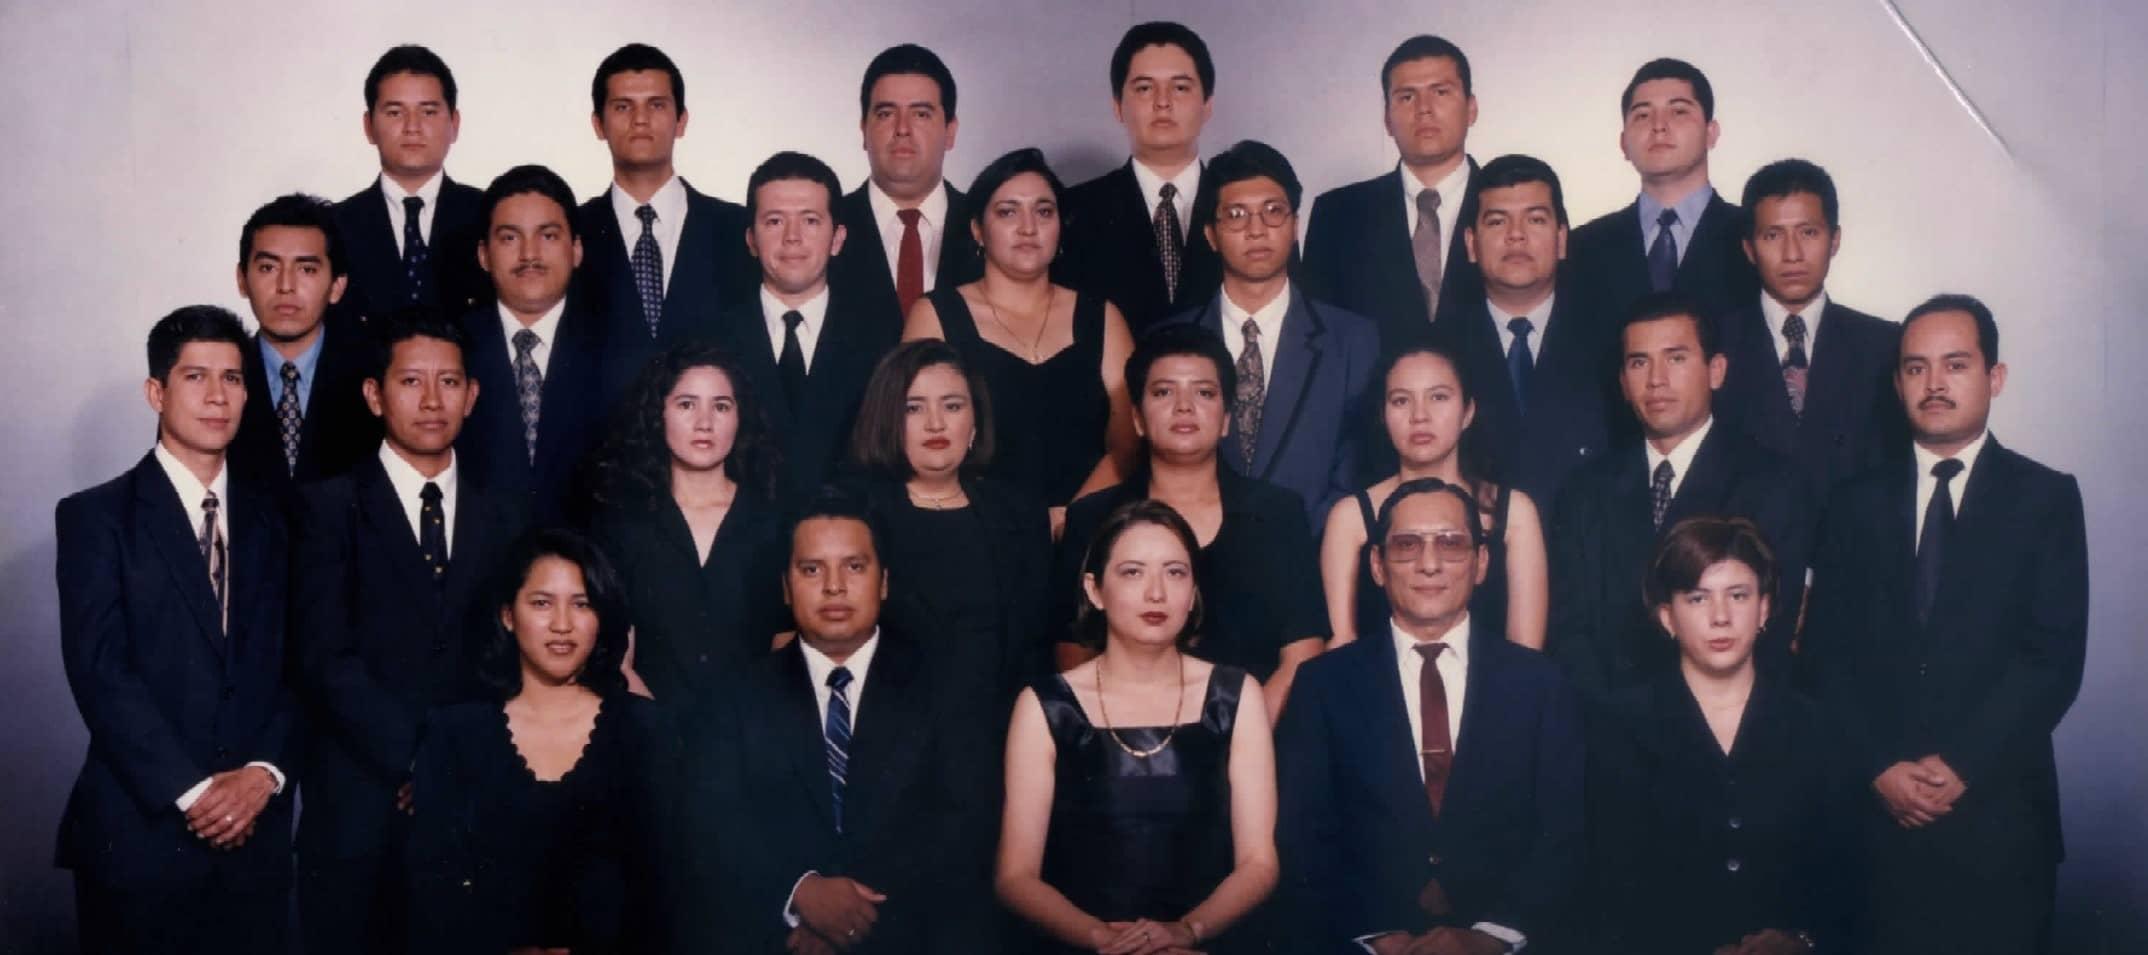 Egresados_2000